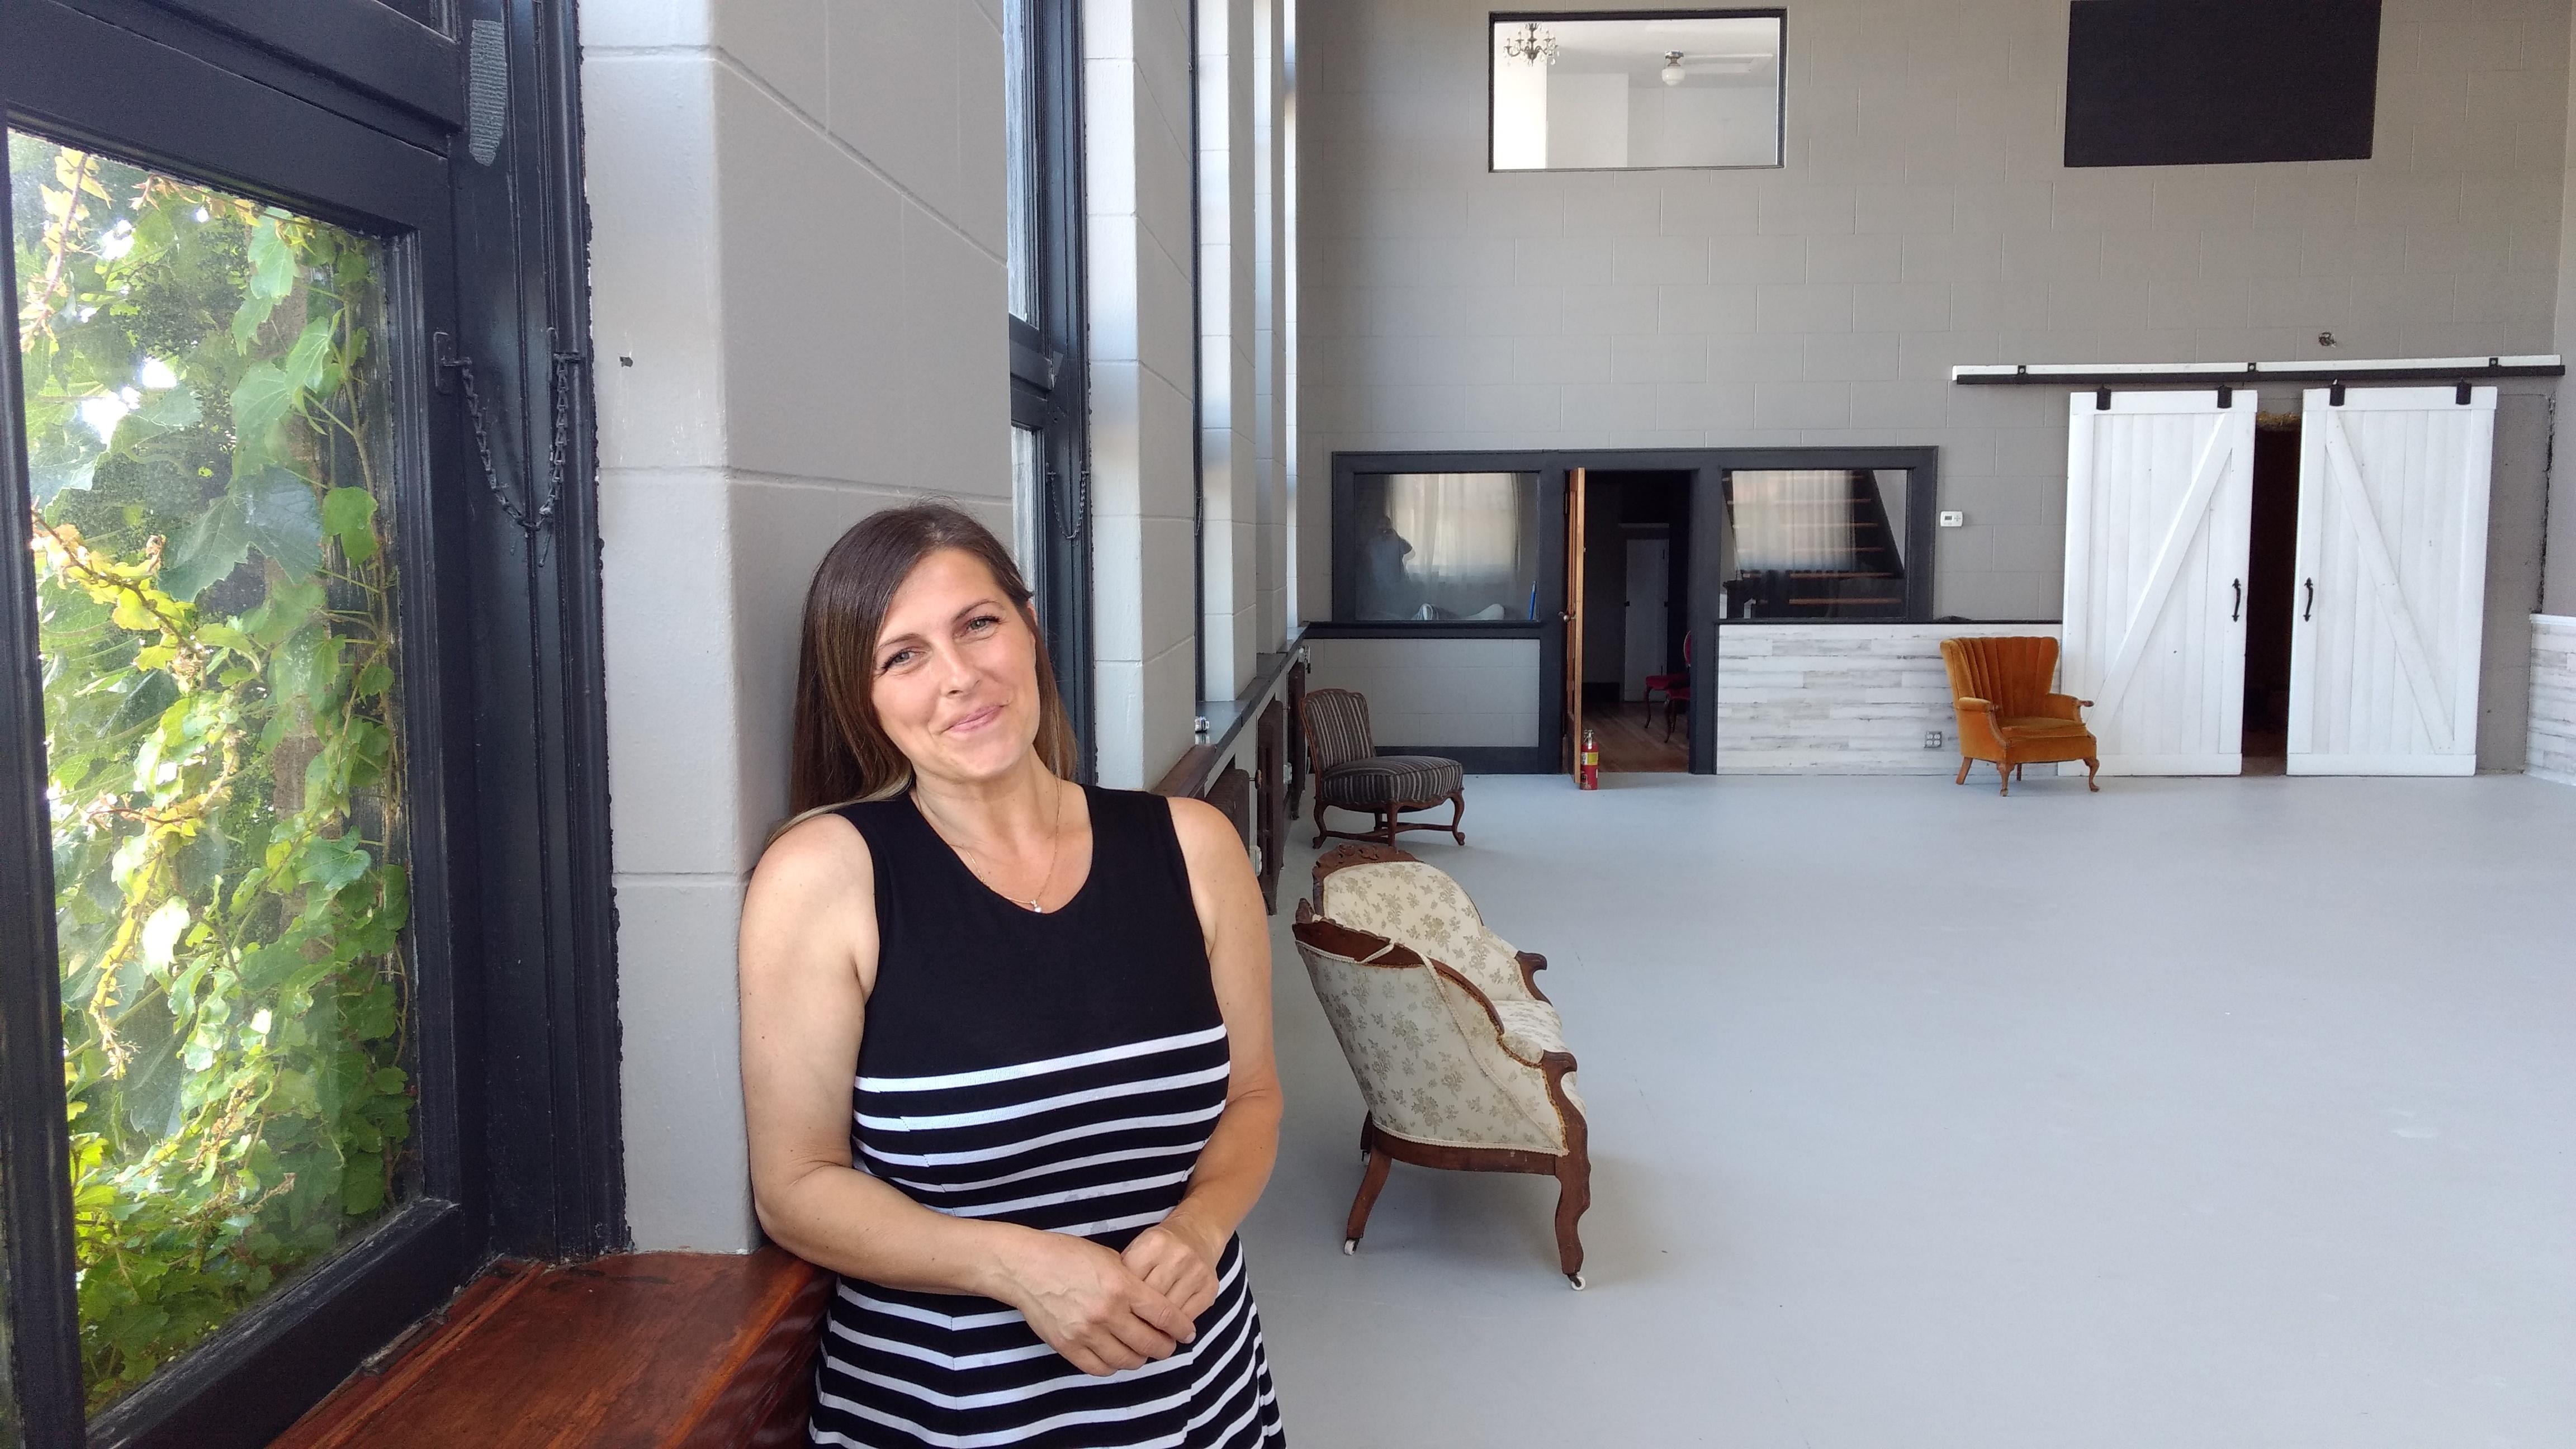 Simona Nicolau poses inside her new studio and events space, Vine Creative Spaces Studio (July 25, 2019). Photo: My Ferndale News